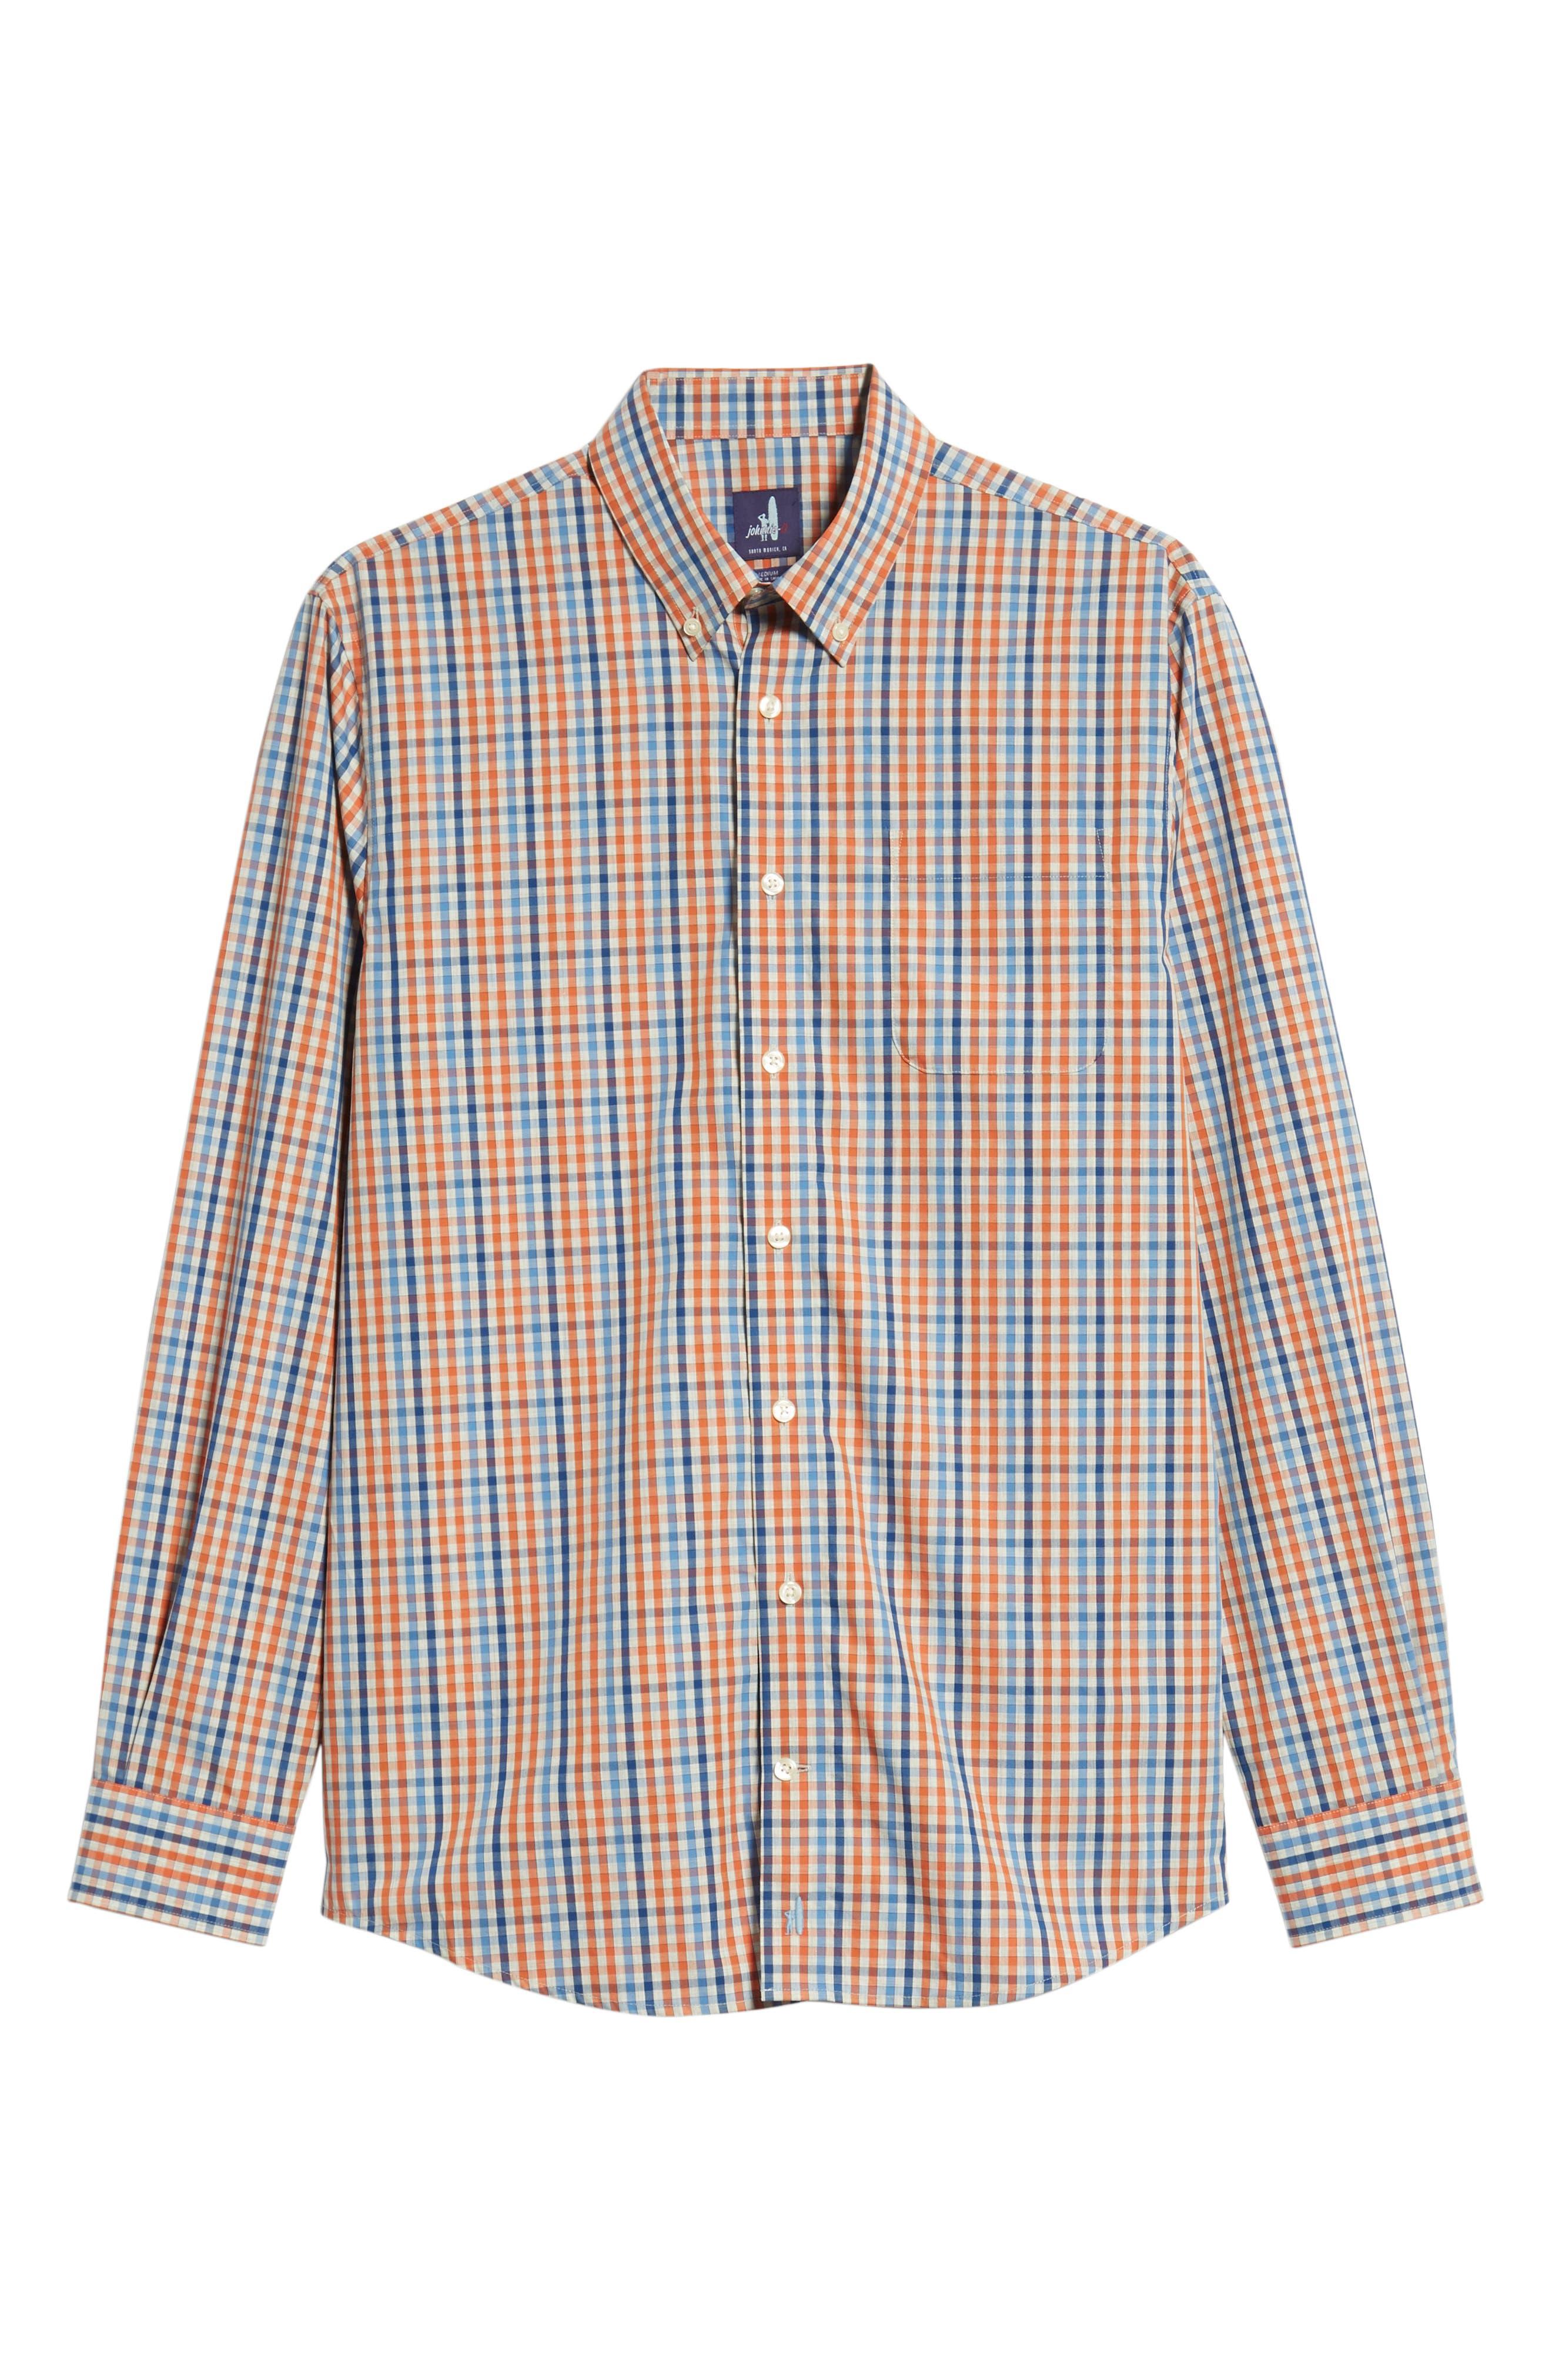 Rawlings Classic Fit Sport Shirt,                             Alternate thumbnail 5, color,                             MARINER